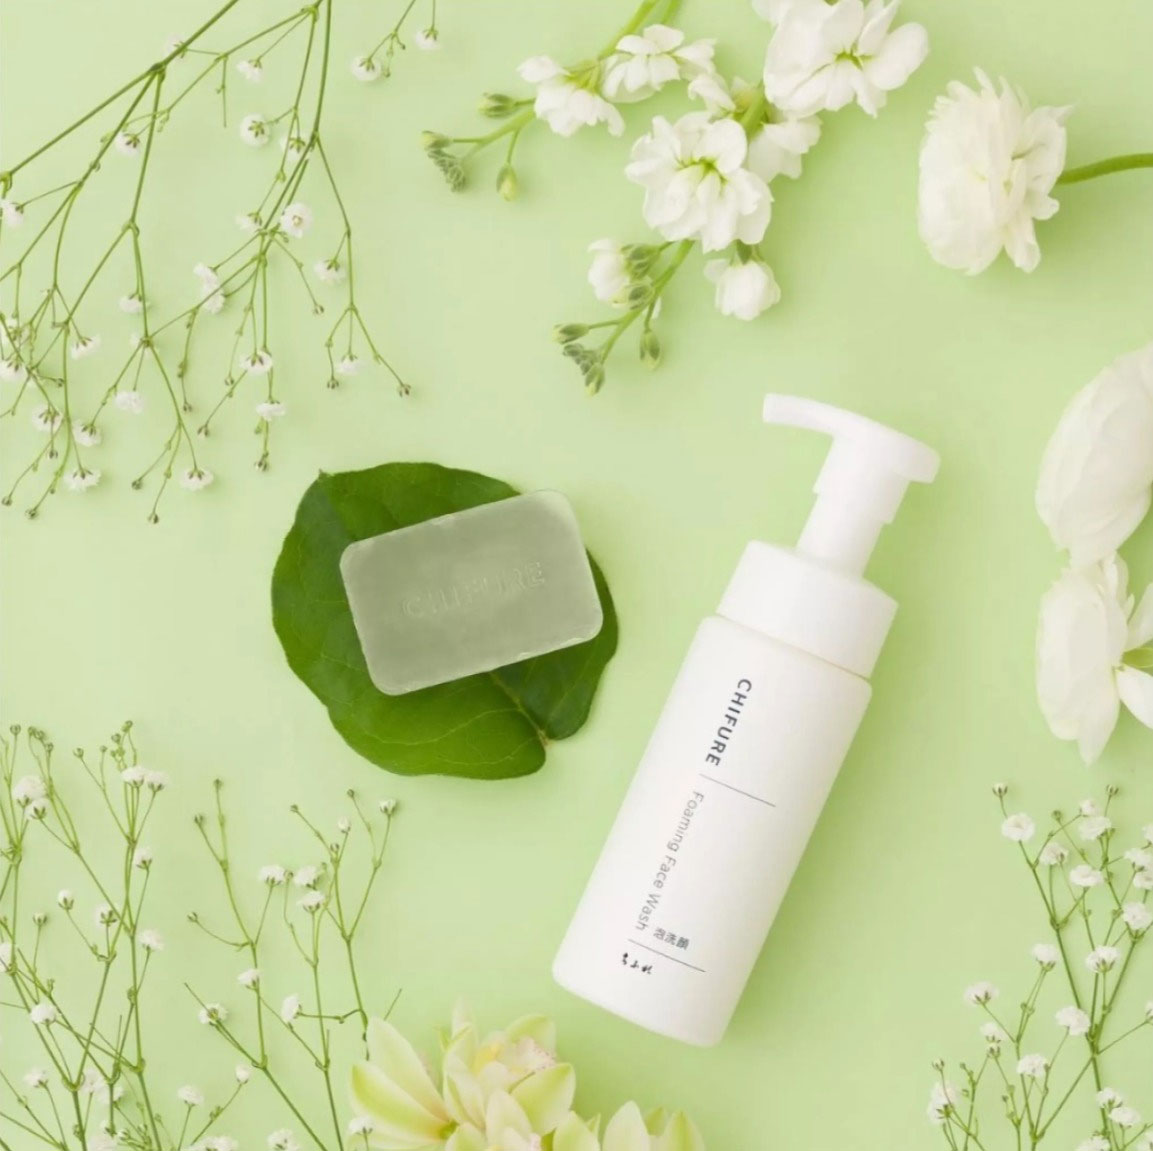 Sữa Rửa Mặt Tẩy Trang Chifure Foaming Face Wash 180ml